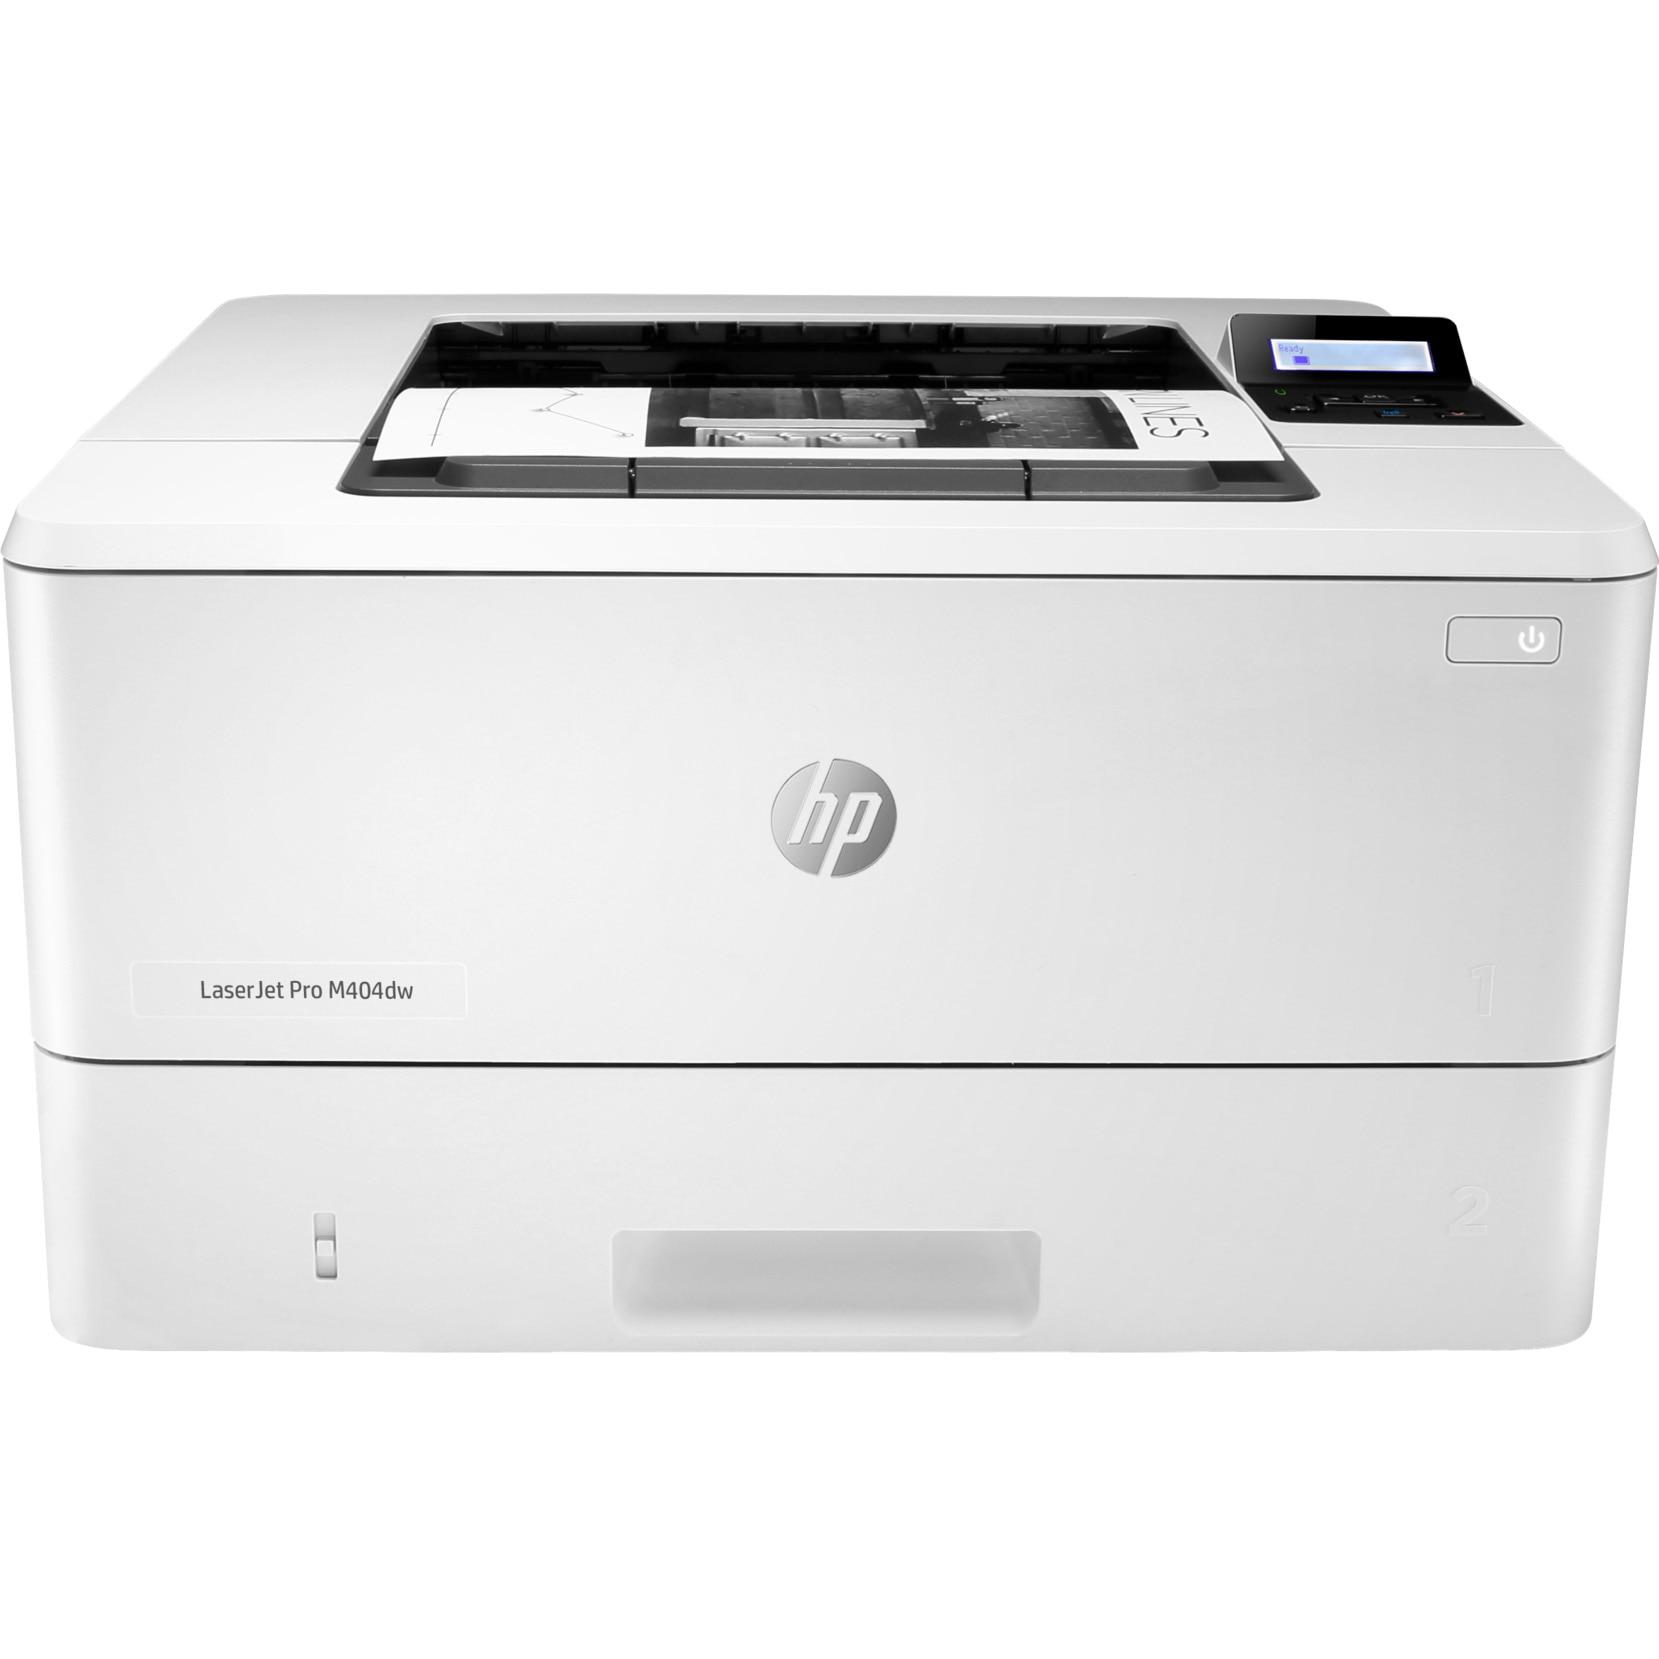 Fotografie Imprimanta laser monocrom HP LaserJet Pro M404dw, Duplex, Retea, Wireless, A4